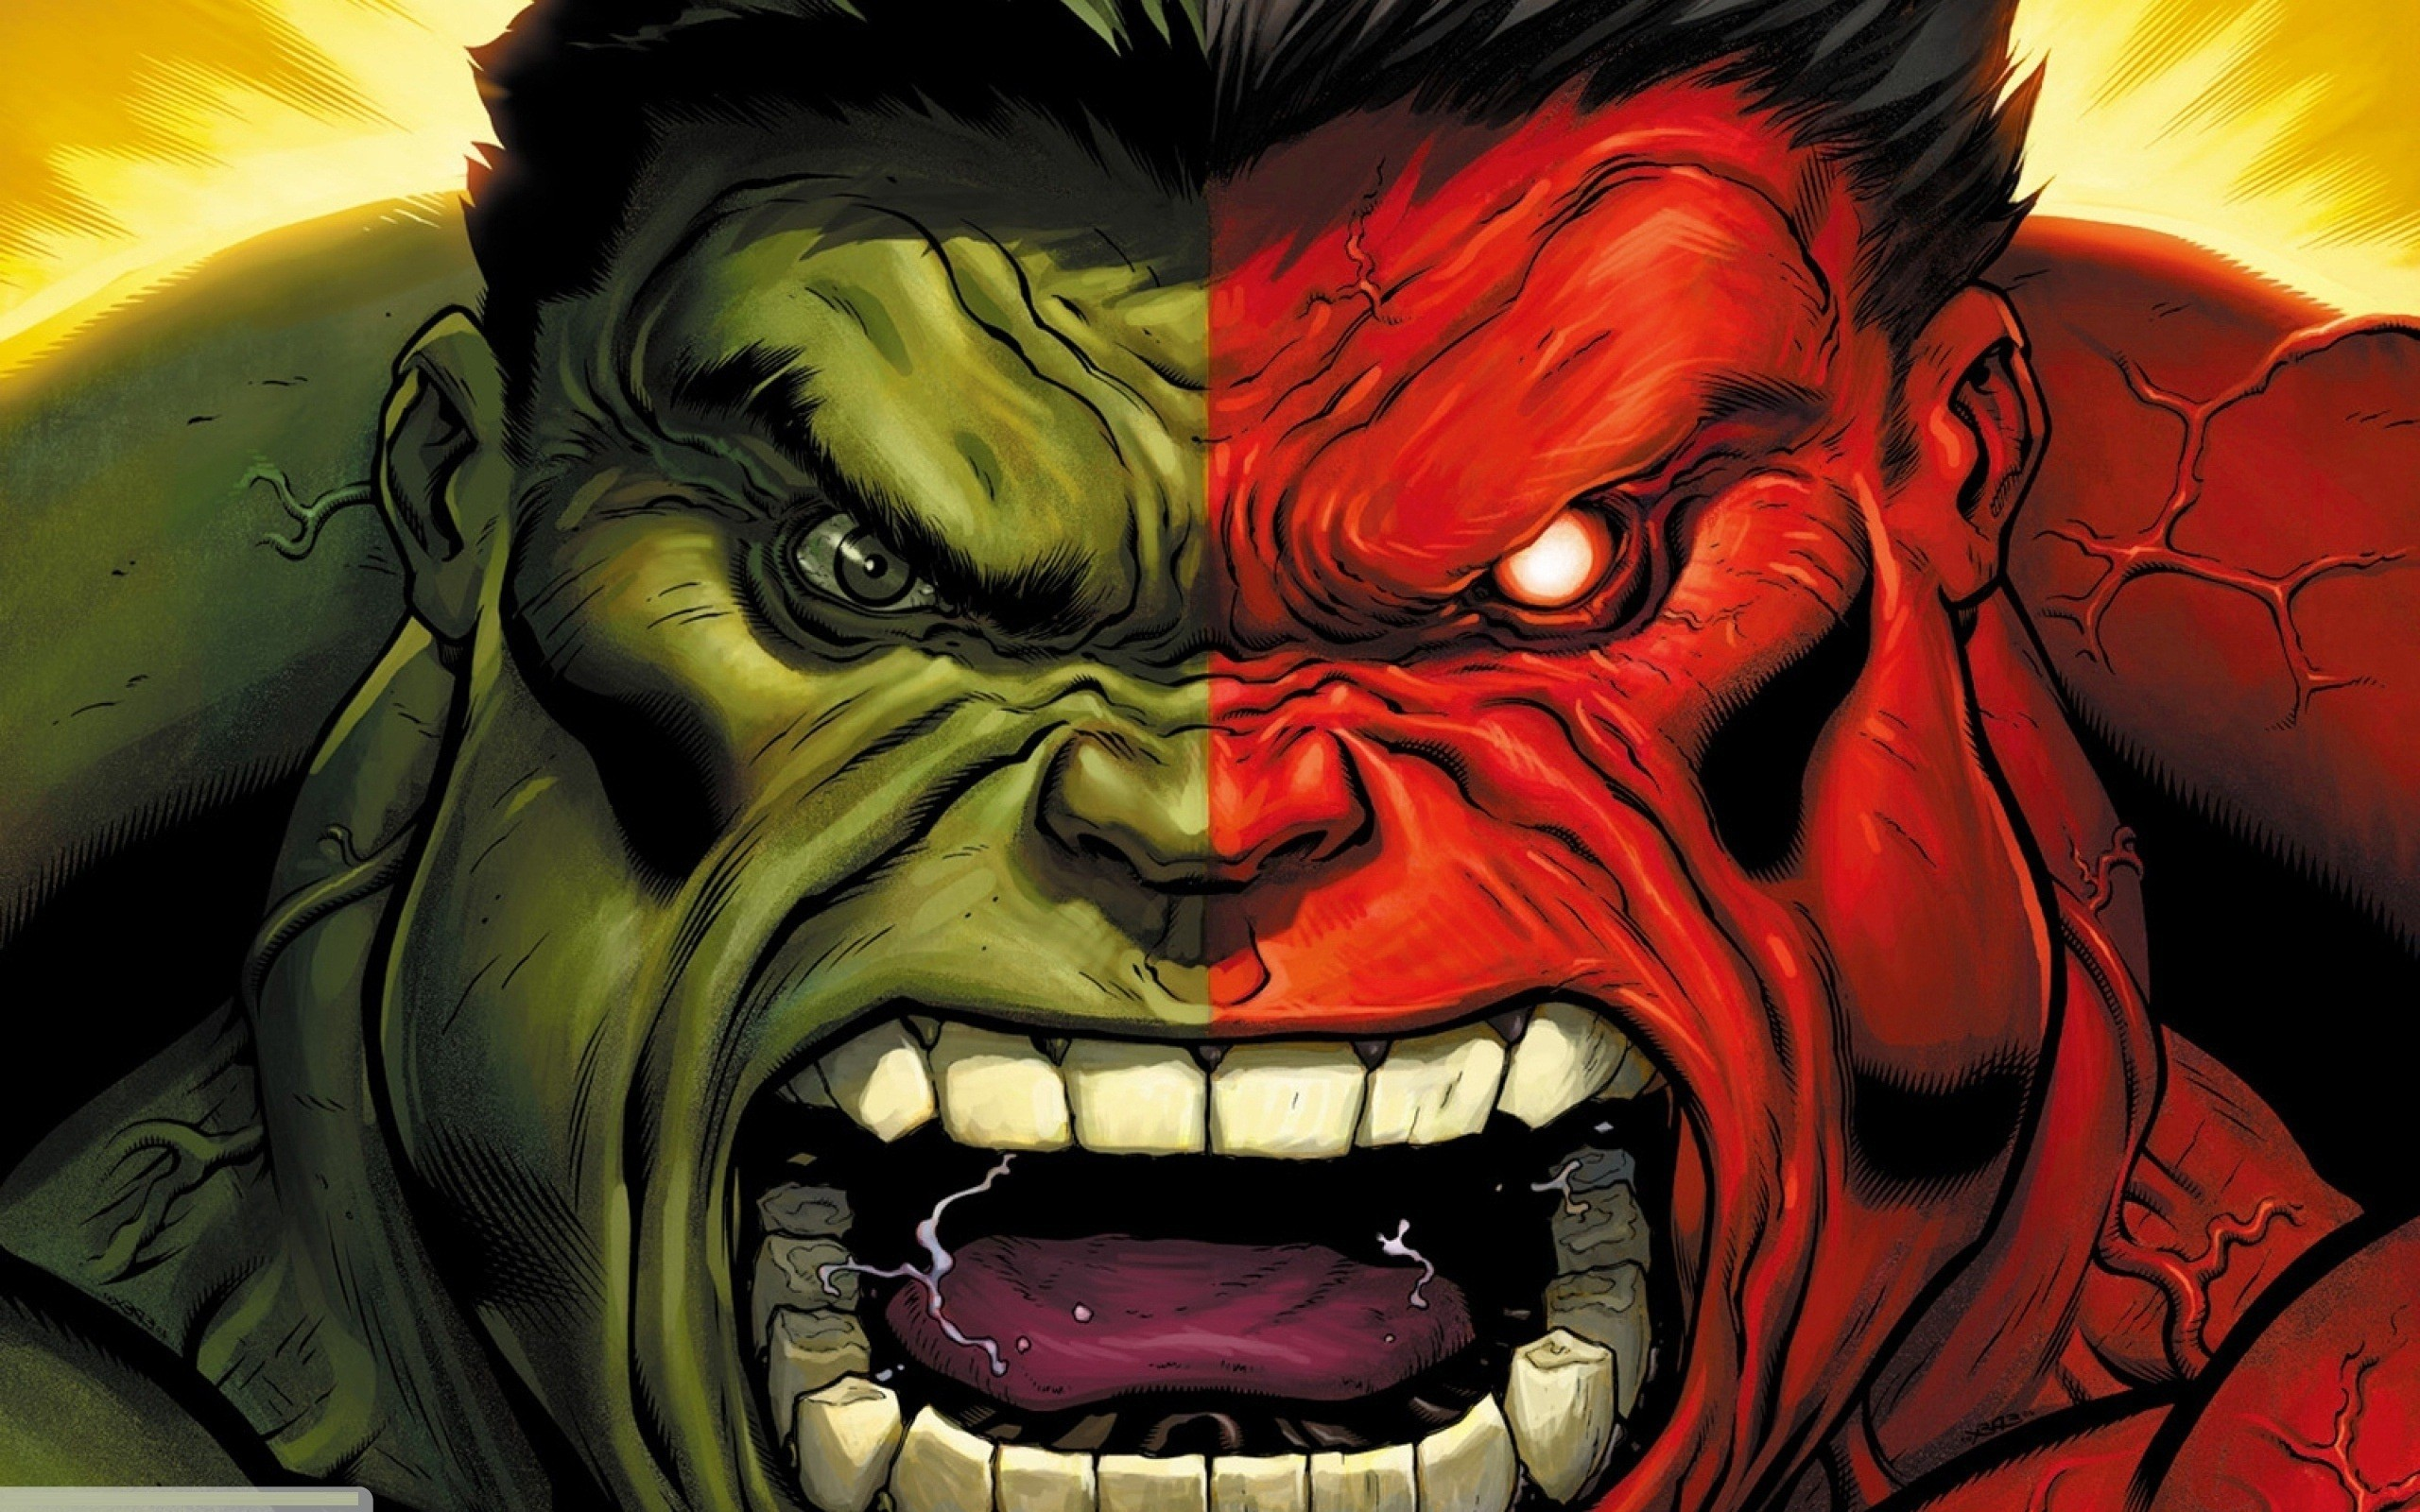 Green hulk comic character comics marvel red wallpaper 2560x1600